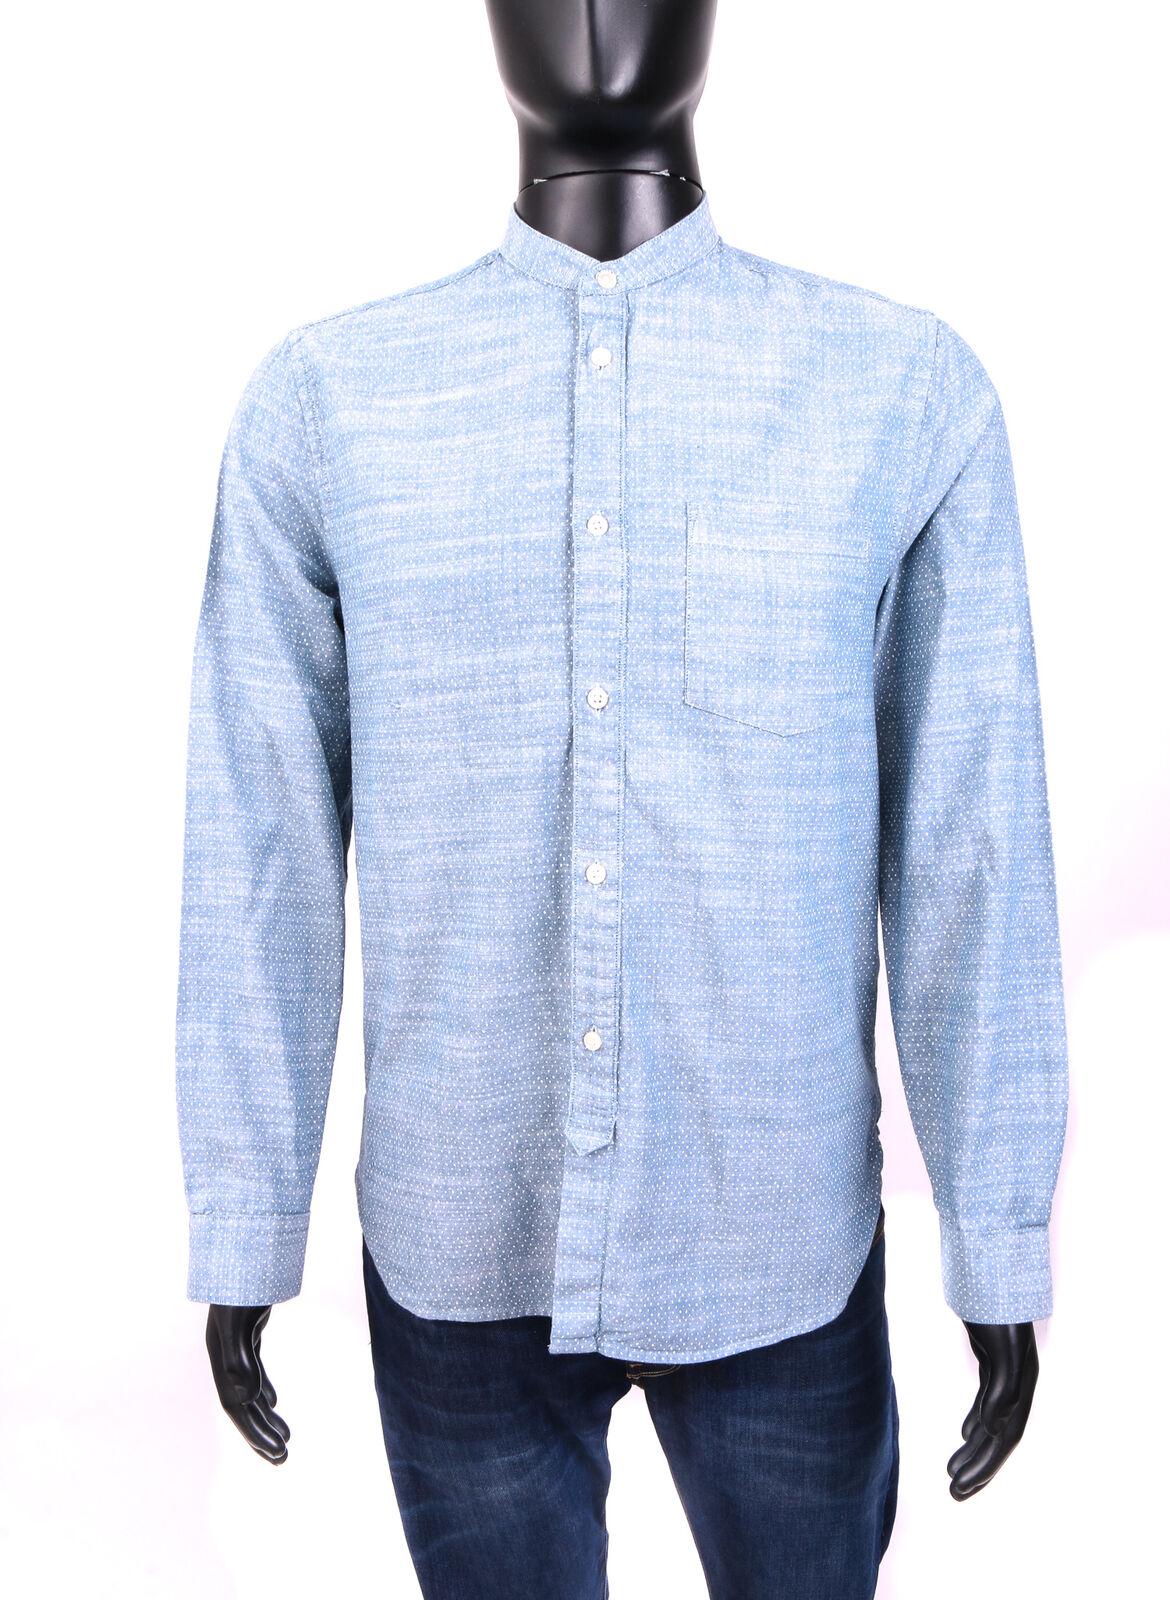 H&M Mens Shirt Tailored Cotton Pattern size M